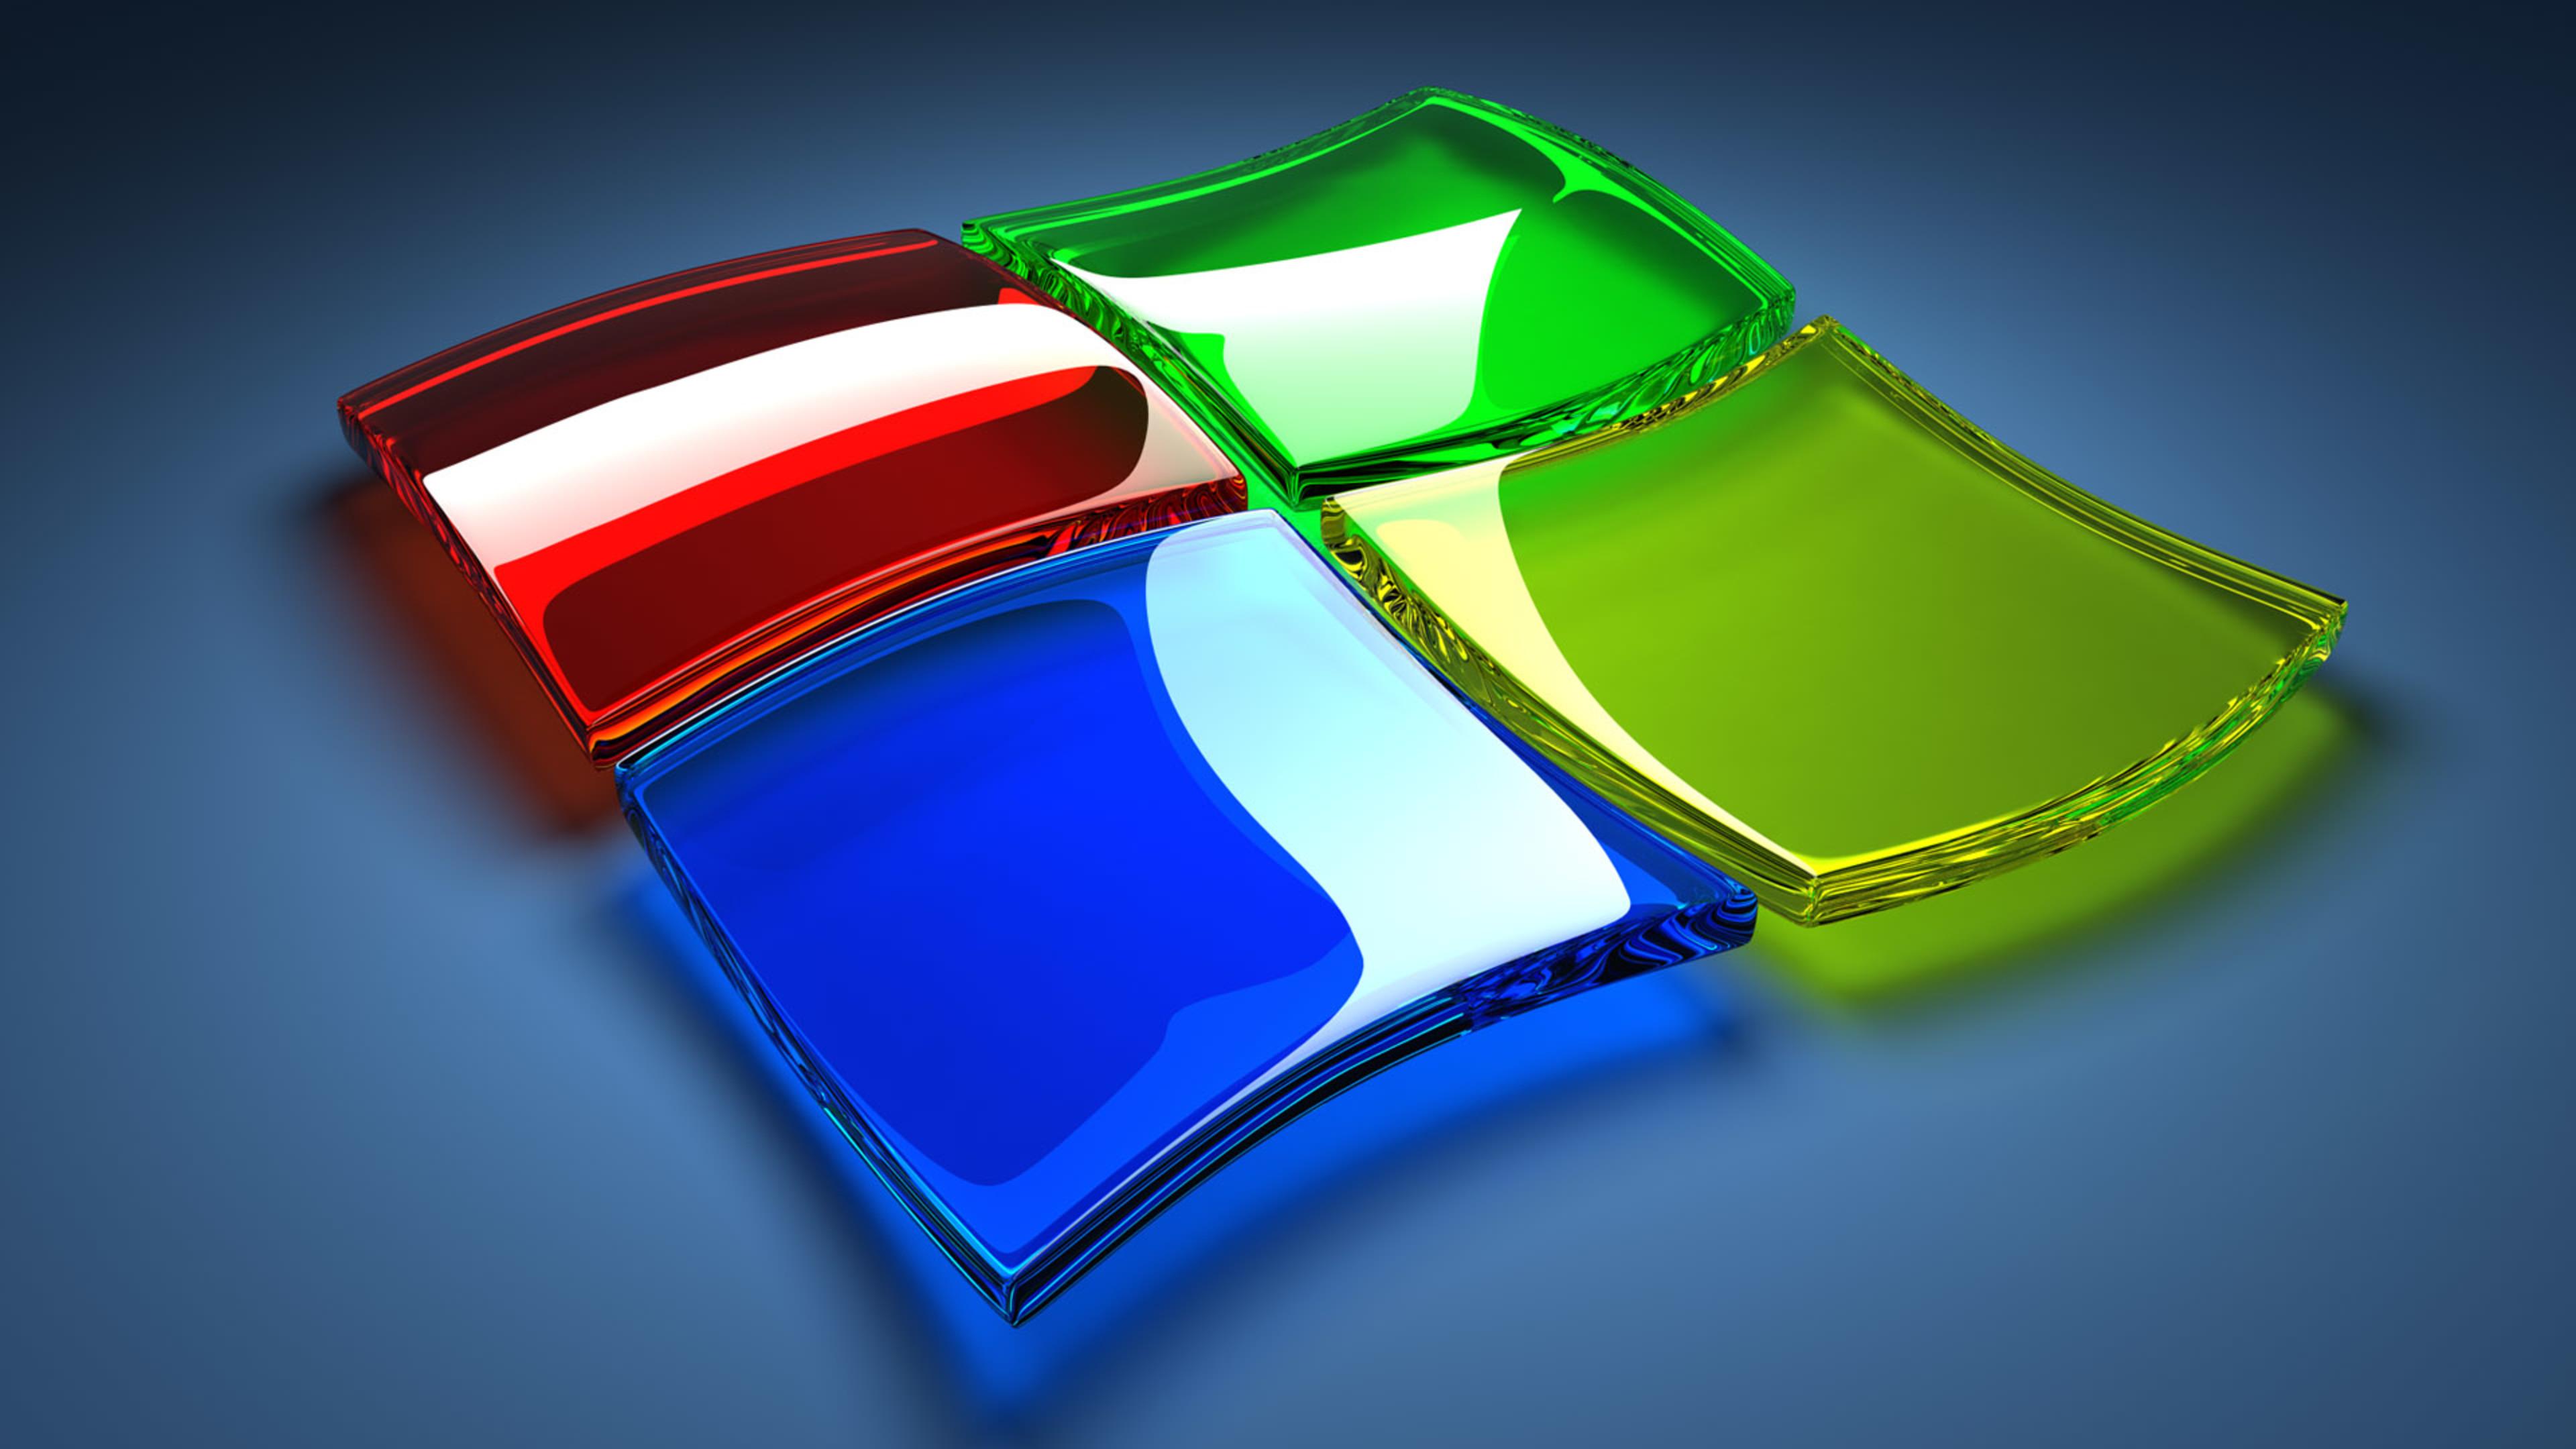 Download Wallpaper 3840x2160 Windows 7 logo   3D Wallpaper 3840x2160